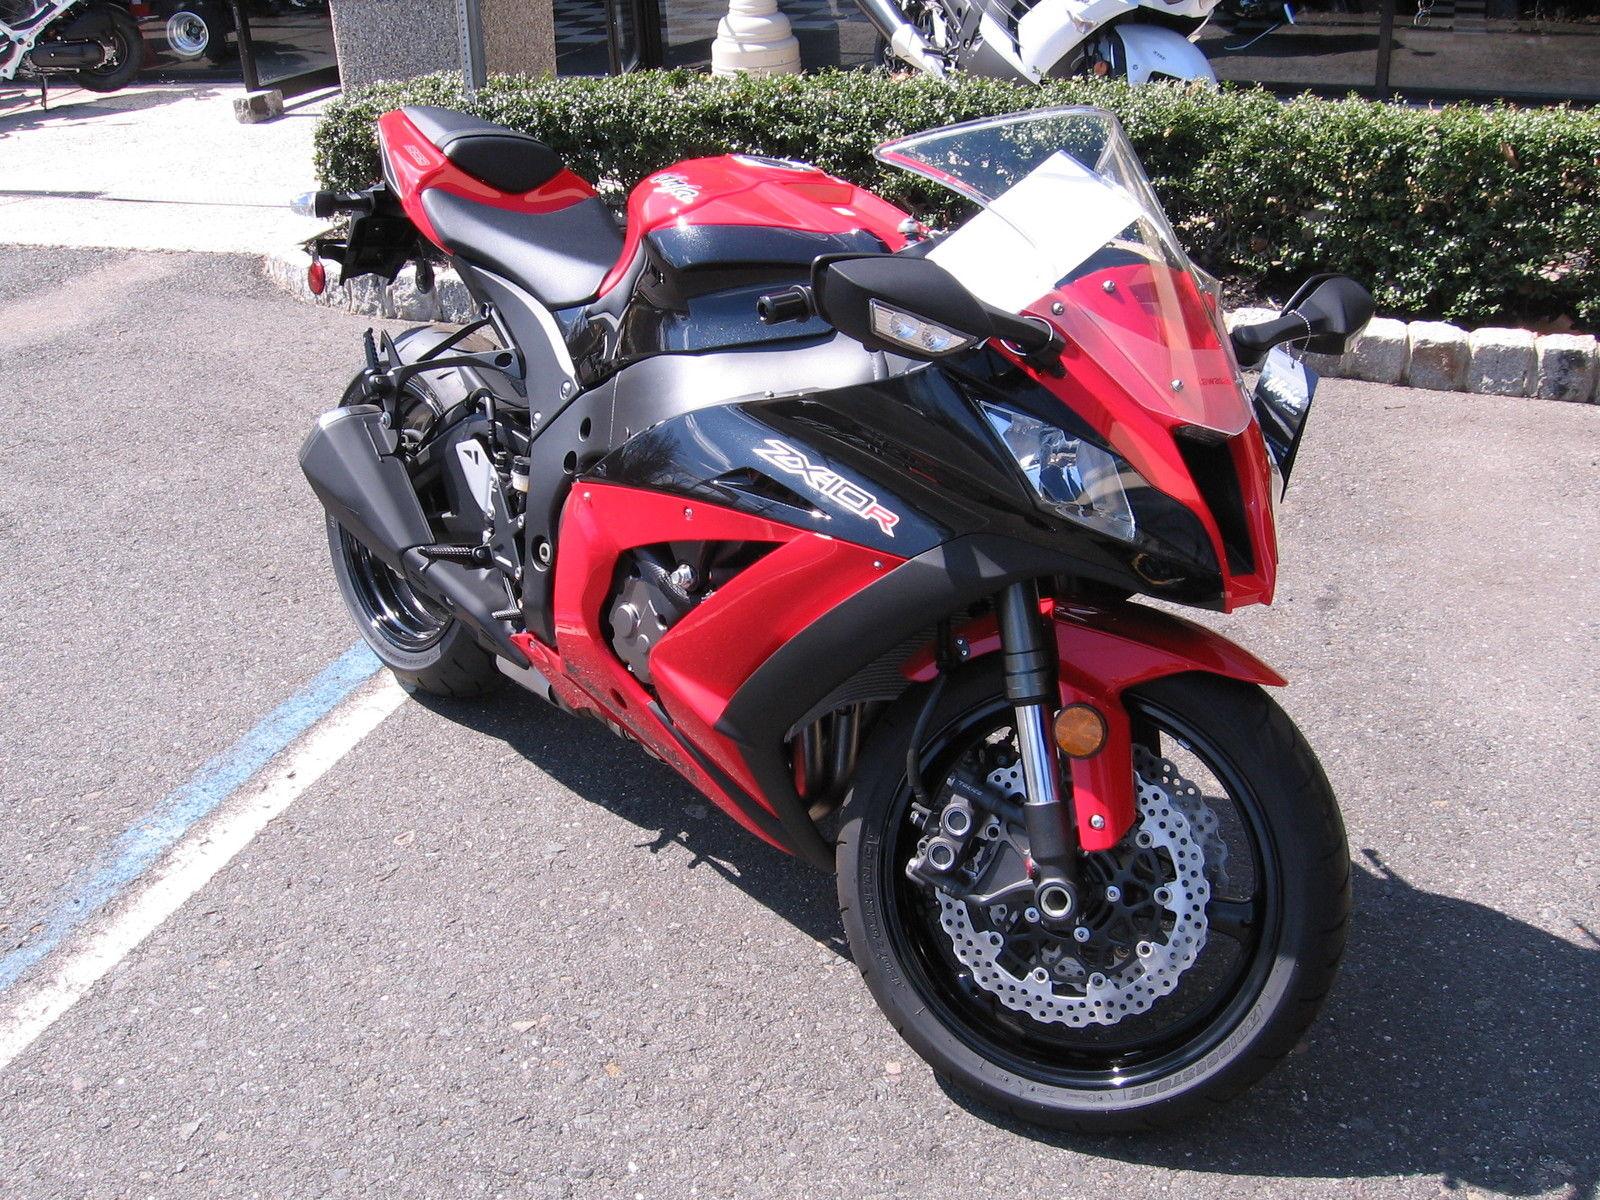 2012 Kawasaki Ninja Zx10r Redblack Zx 10 Zx 10r